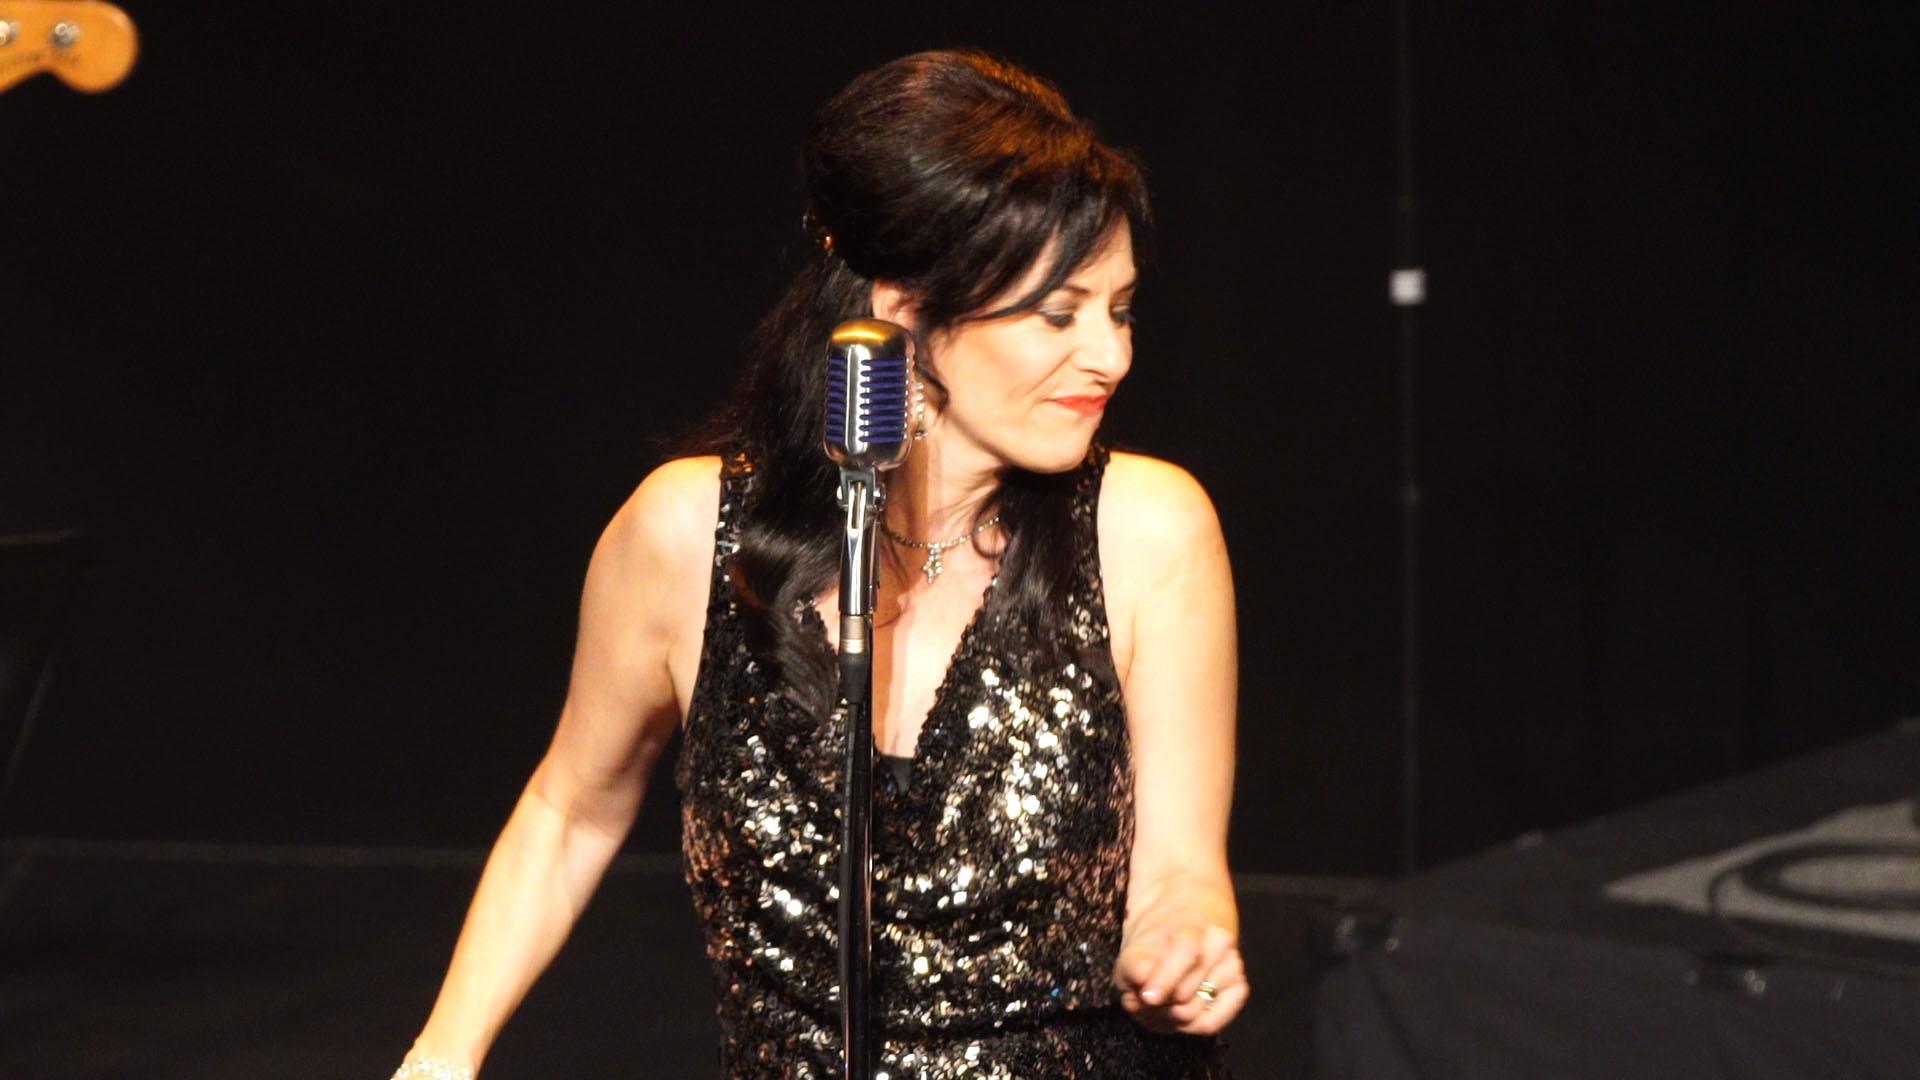 Brenda Lee Cottrell